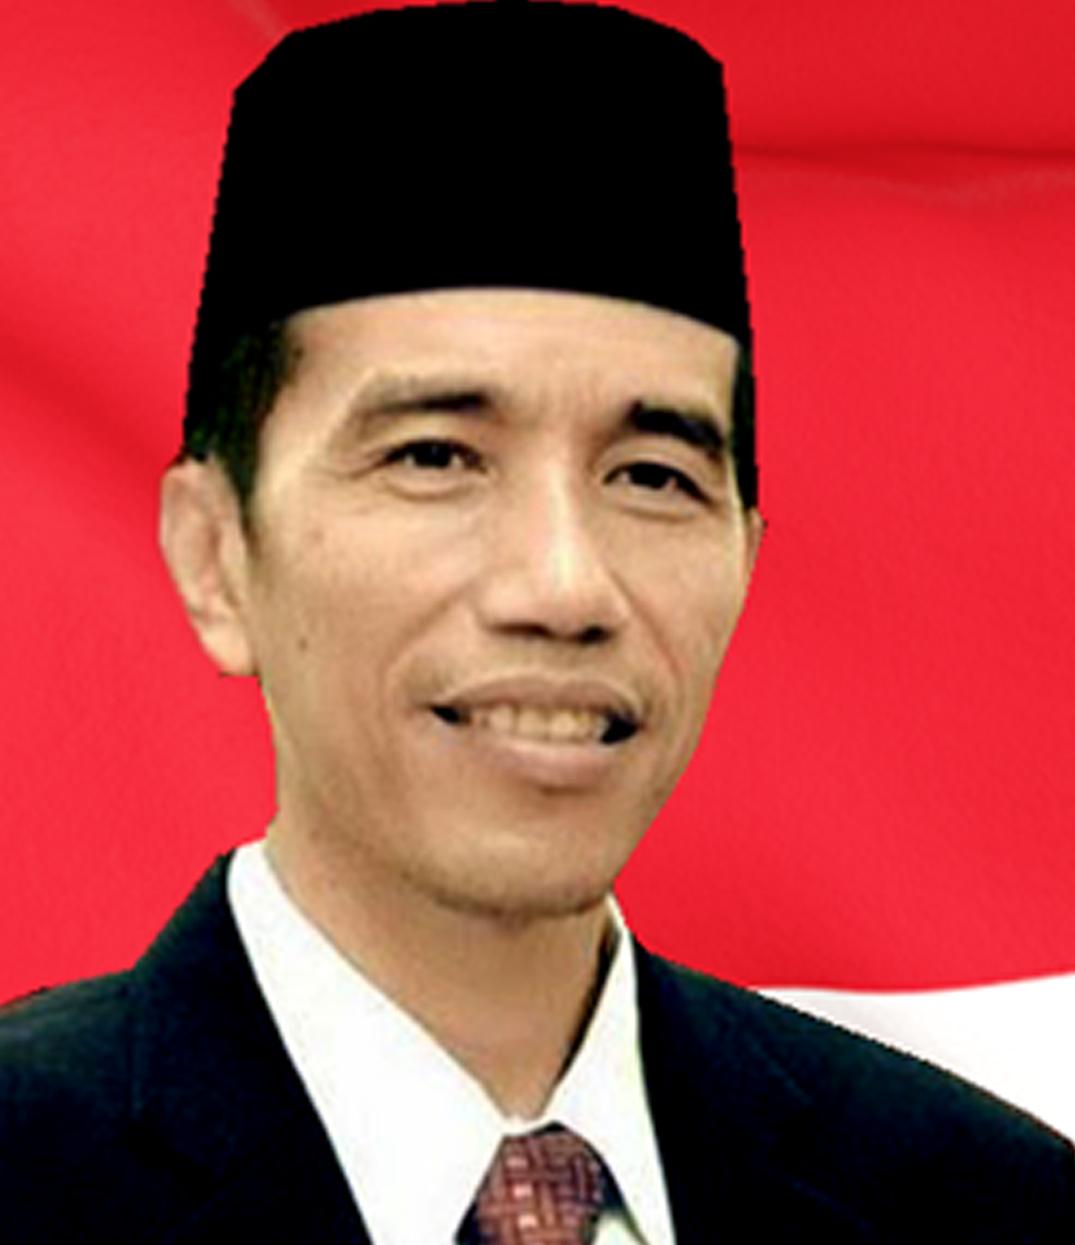 Presiden Ir. Joko Widodo berwarna